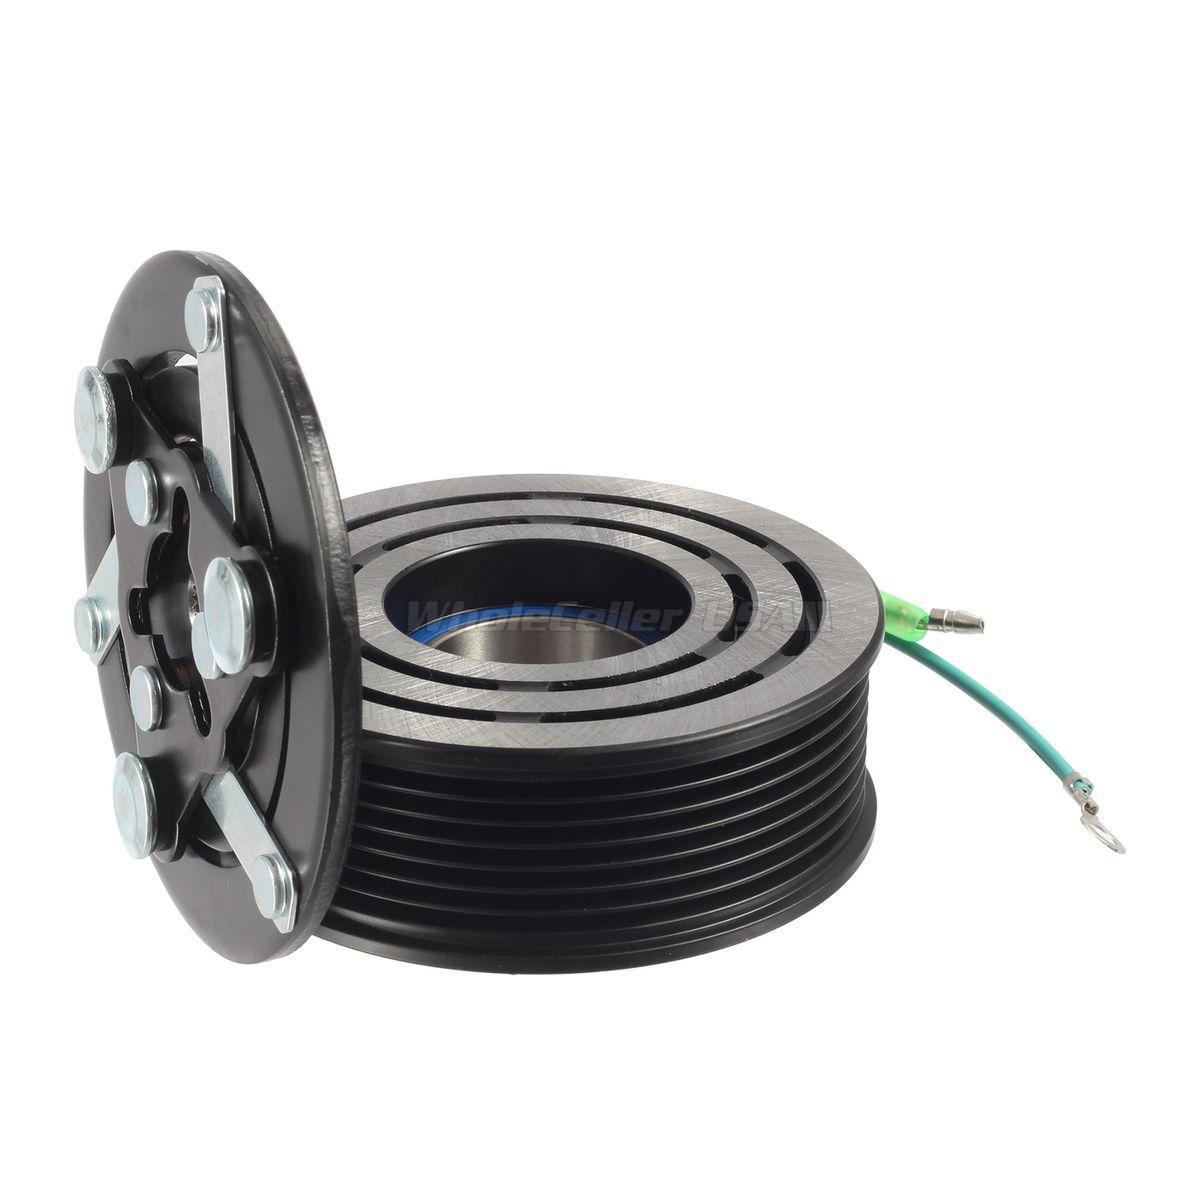 A/C AC Compressor Clutch Assembly Kit For Honda CR-V 2.4L